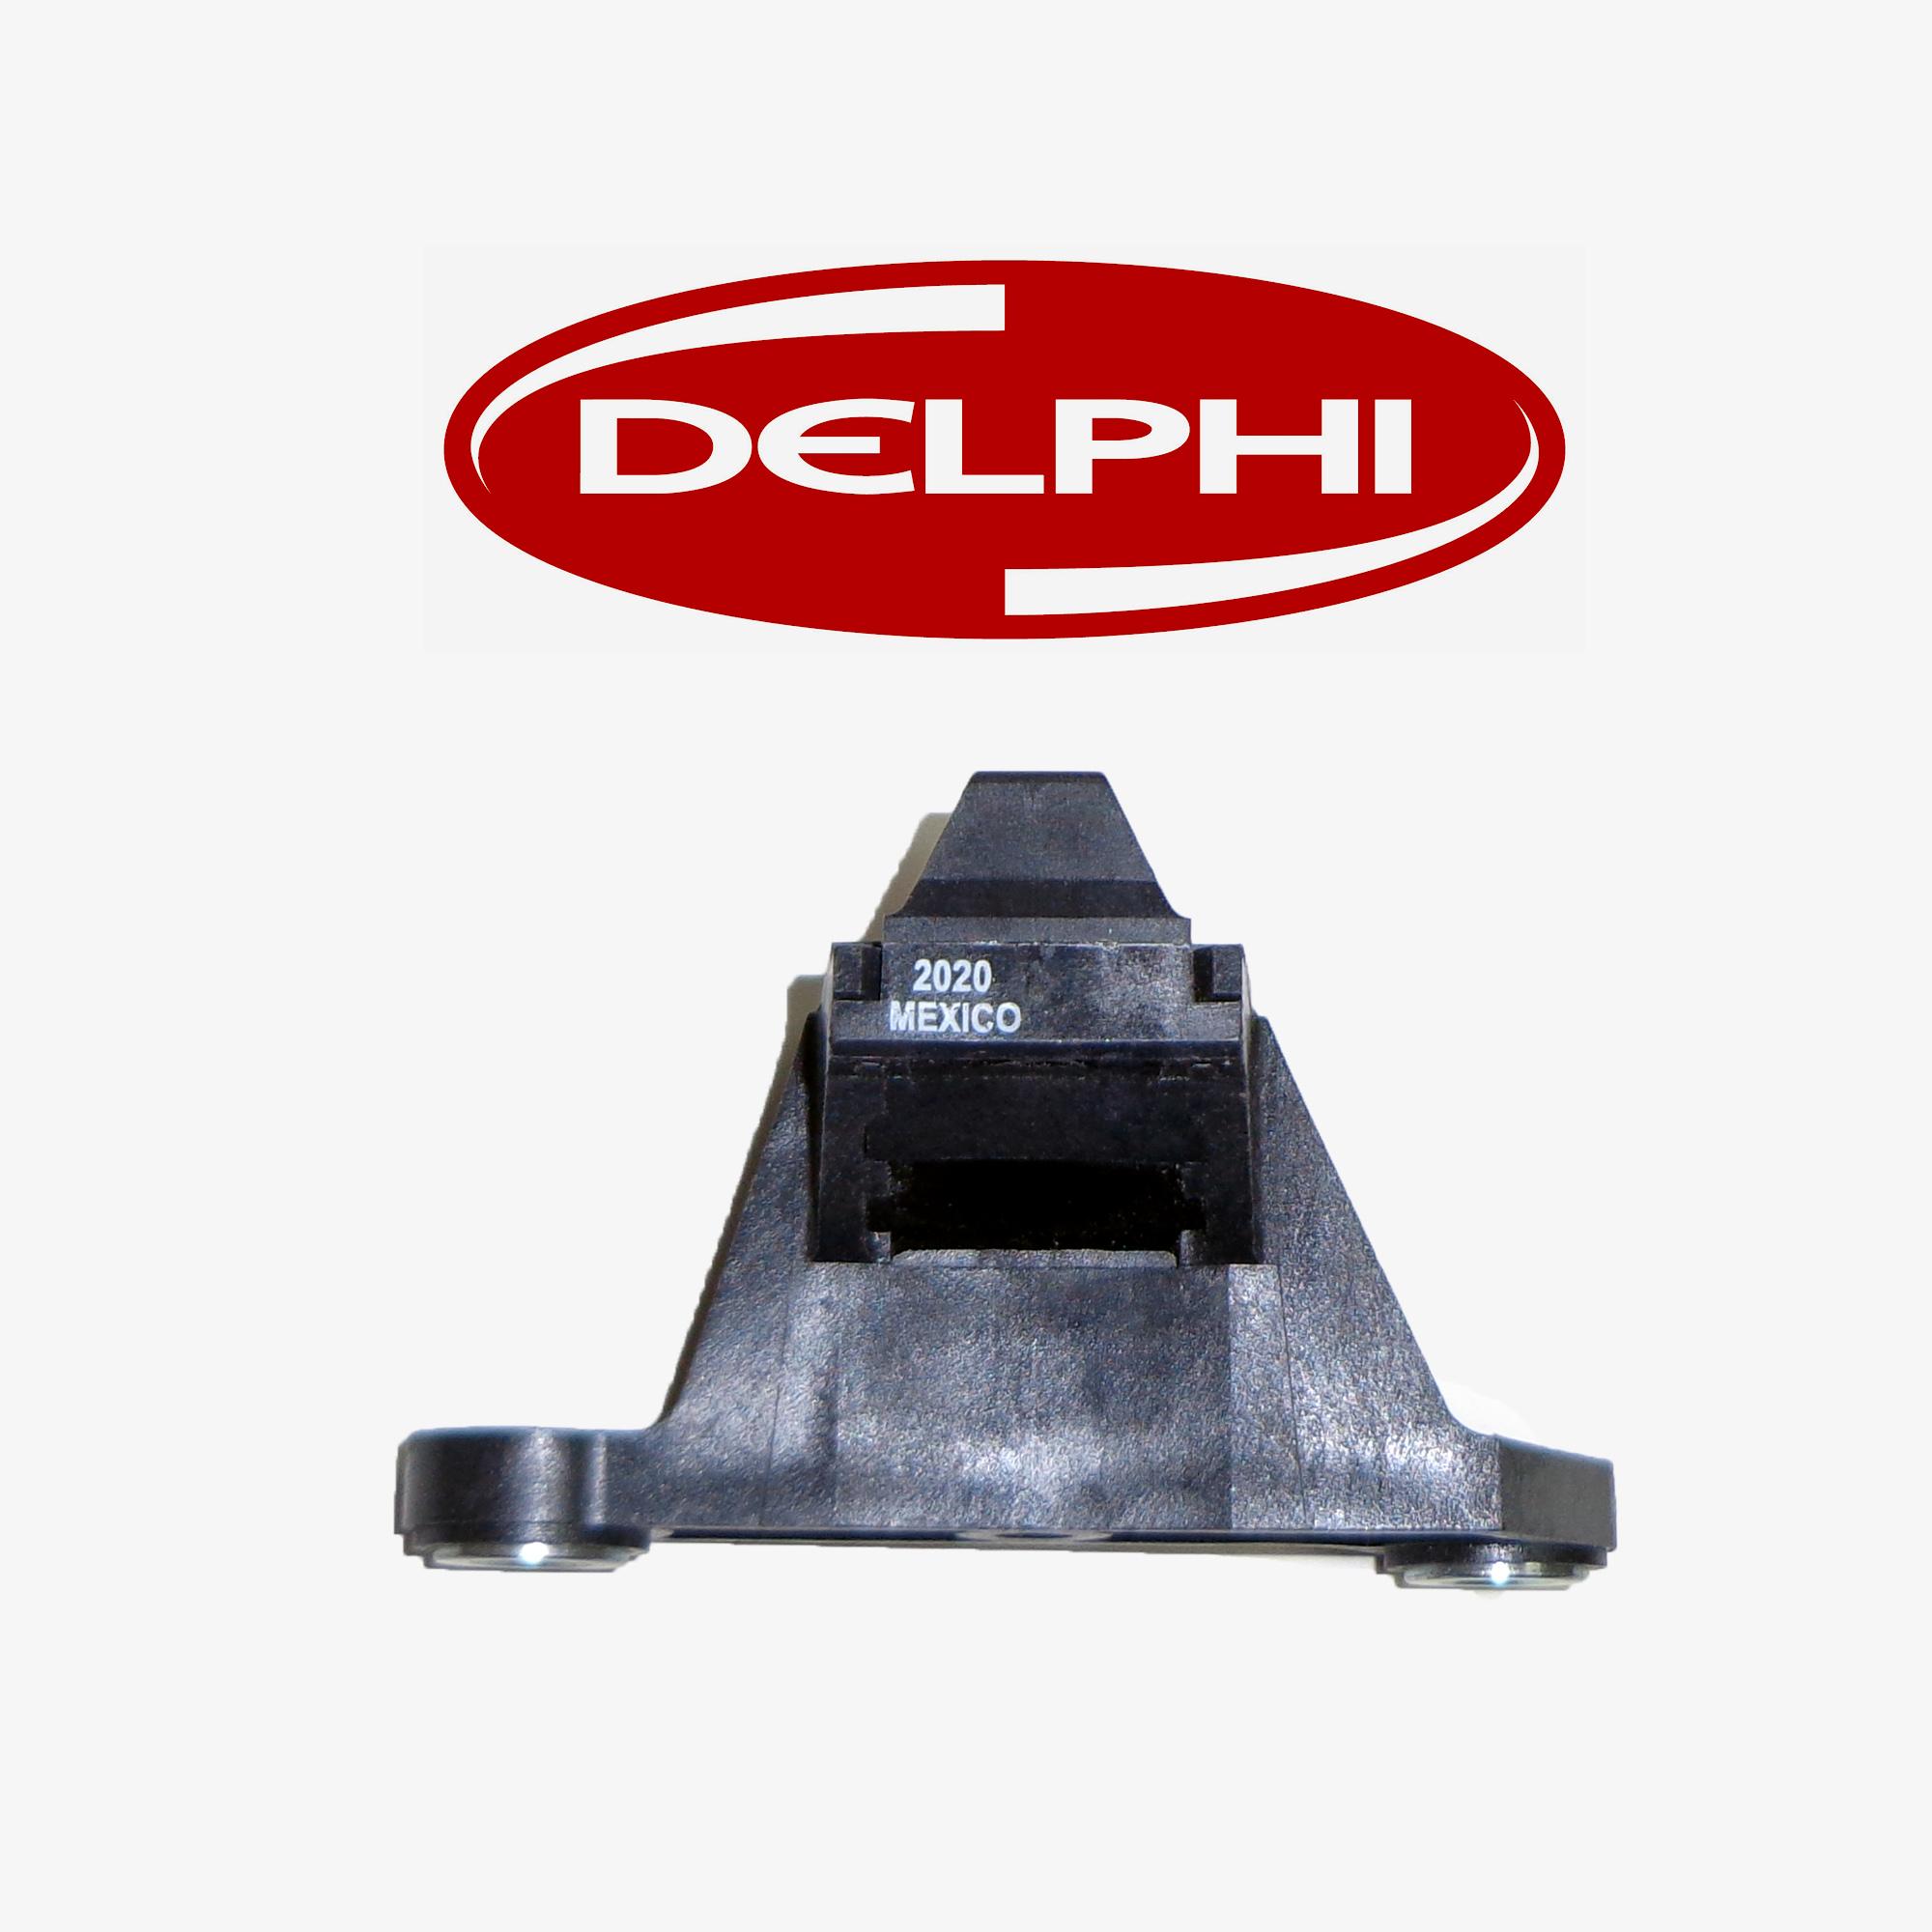 hight resolution of delphi crankshaft position sensor ss10213 for buick chev olds pontiac 93 09 4 4 of 4 see more